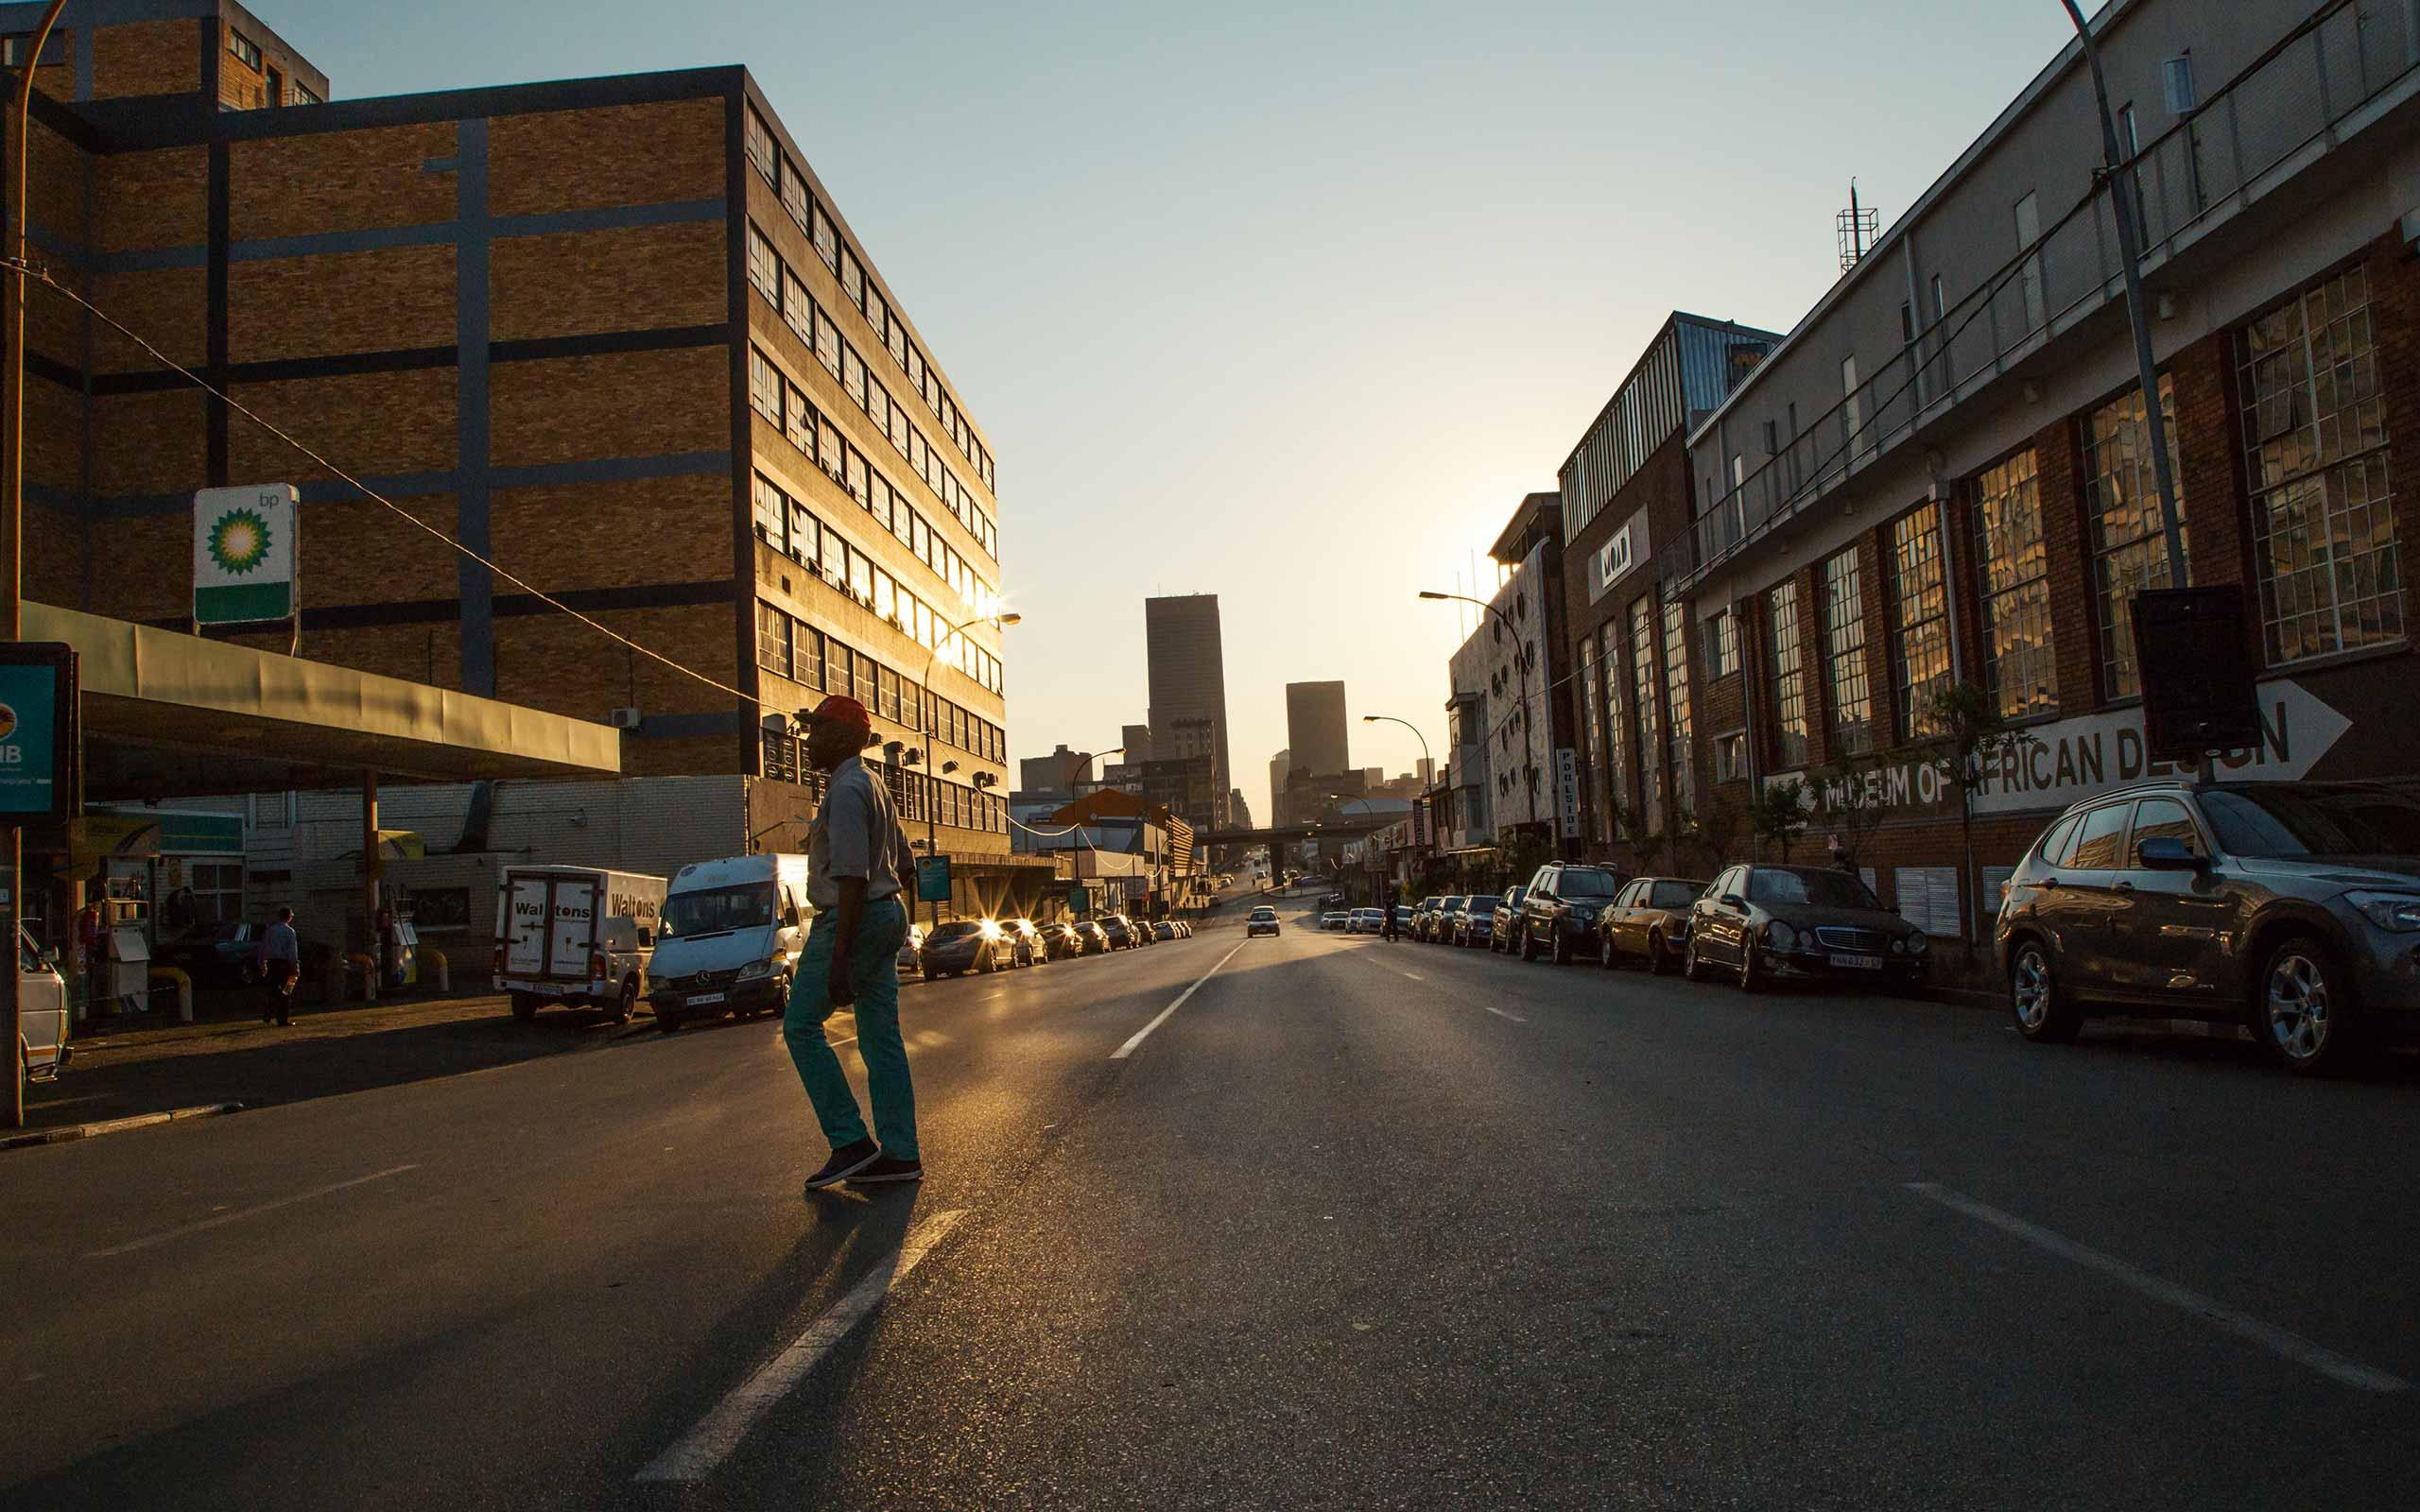 enkosi-africa-safari-sudafrica-johannesburg-maboneng-south-africa-tourism